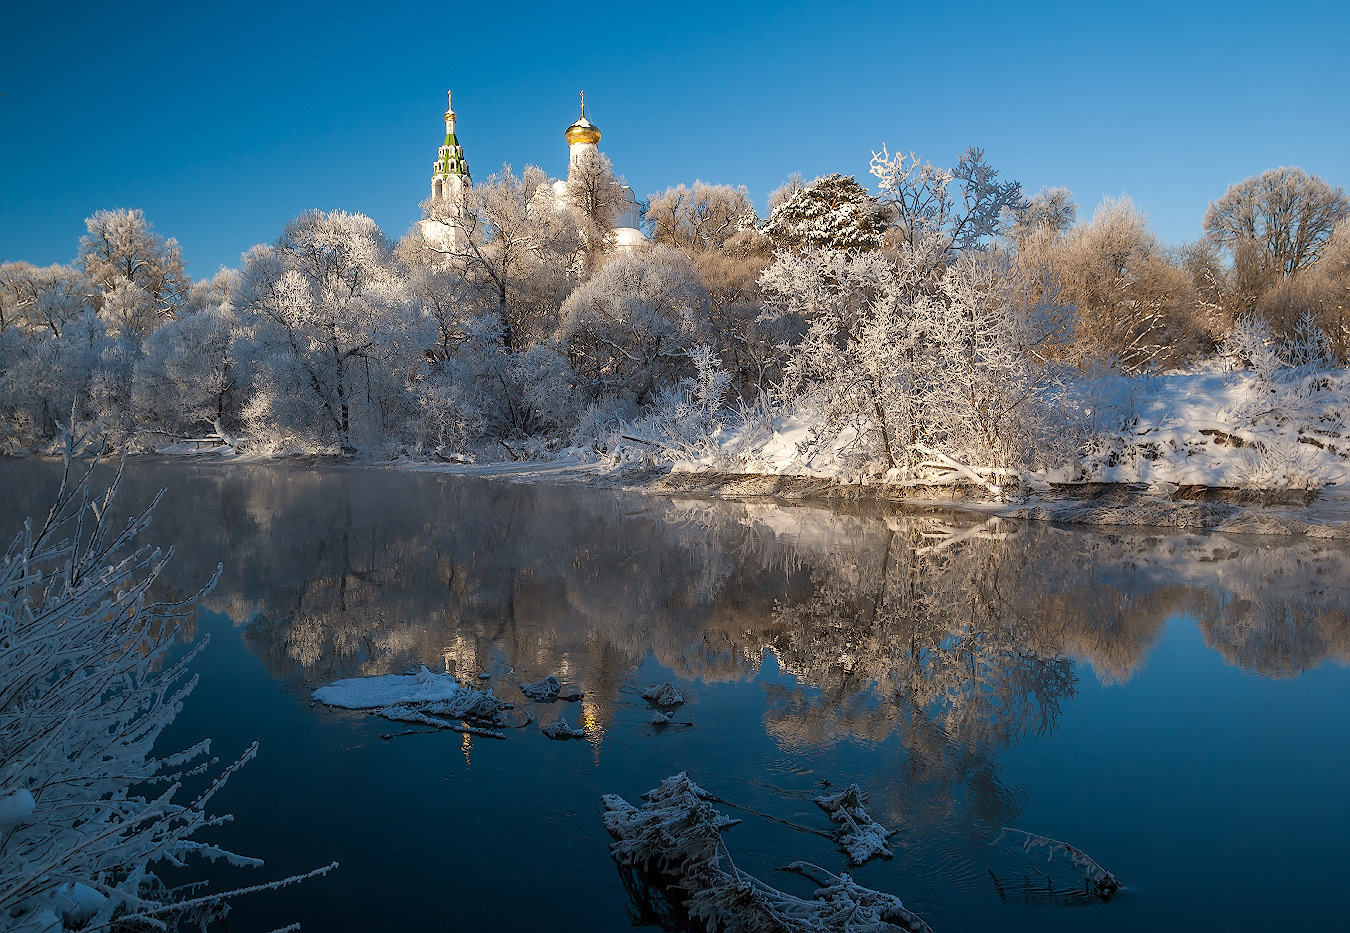 Дня, картинки обои фото мороз зима крещение